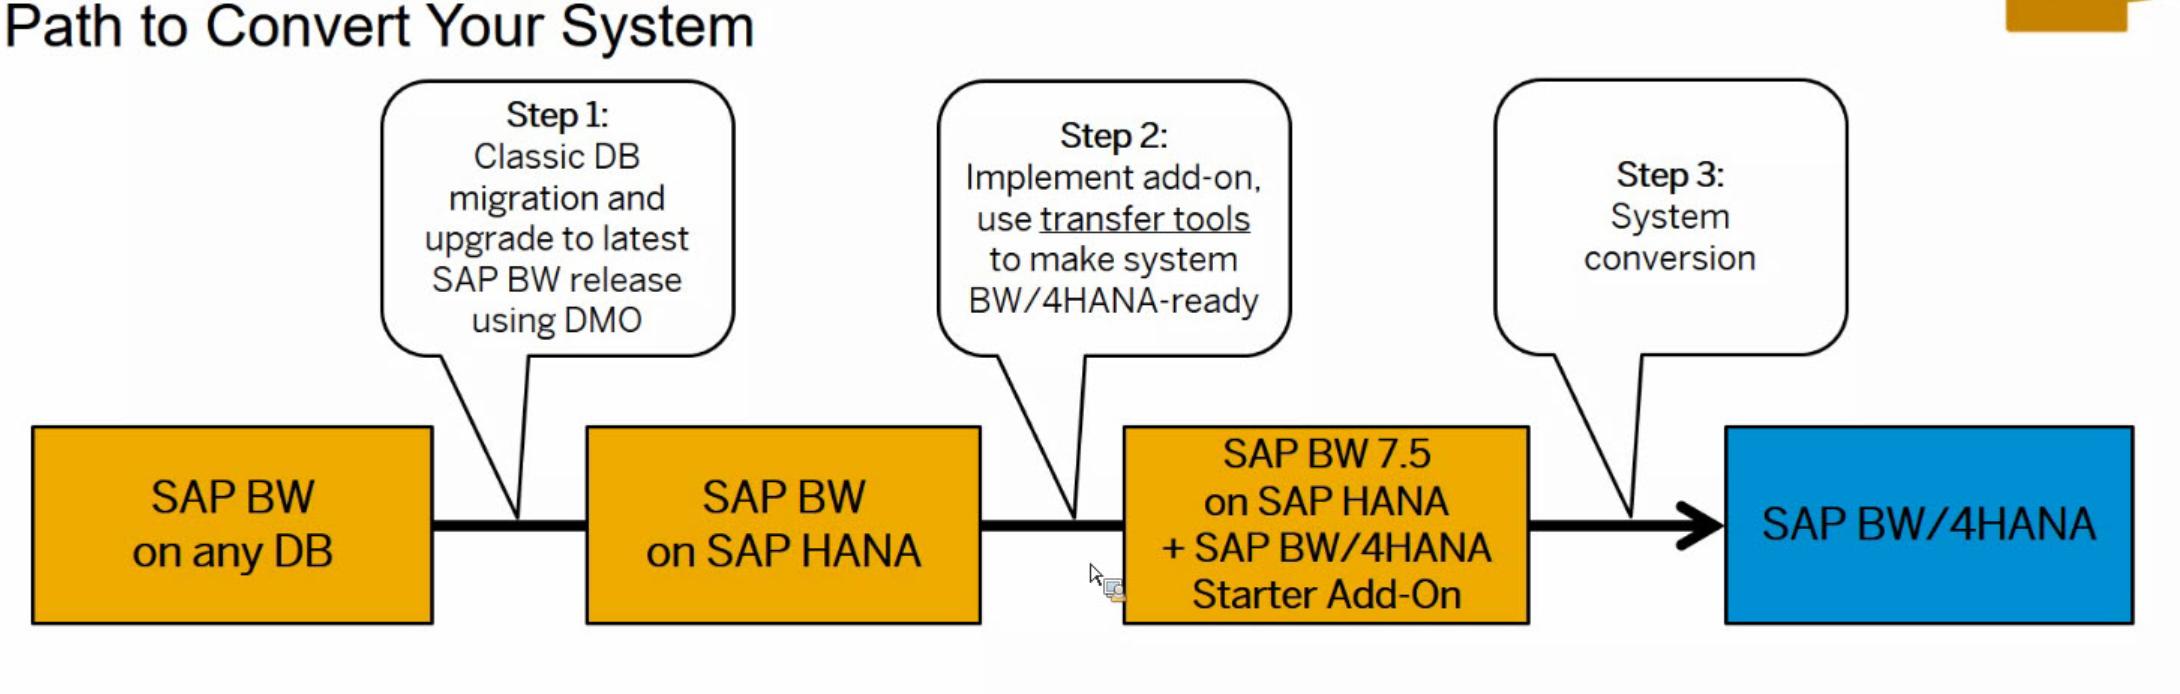 path-convert-system-hana